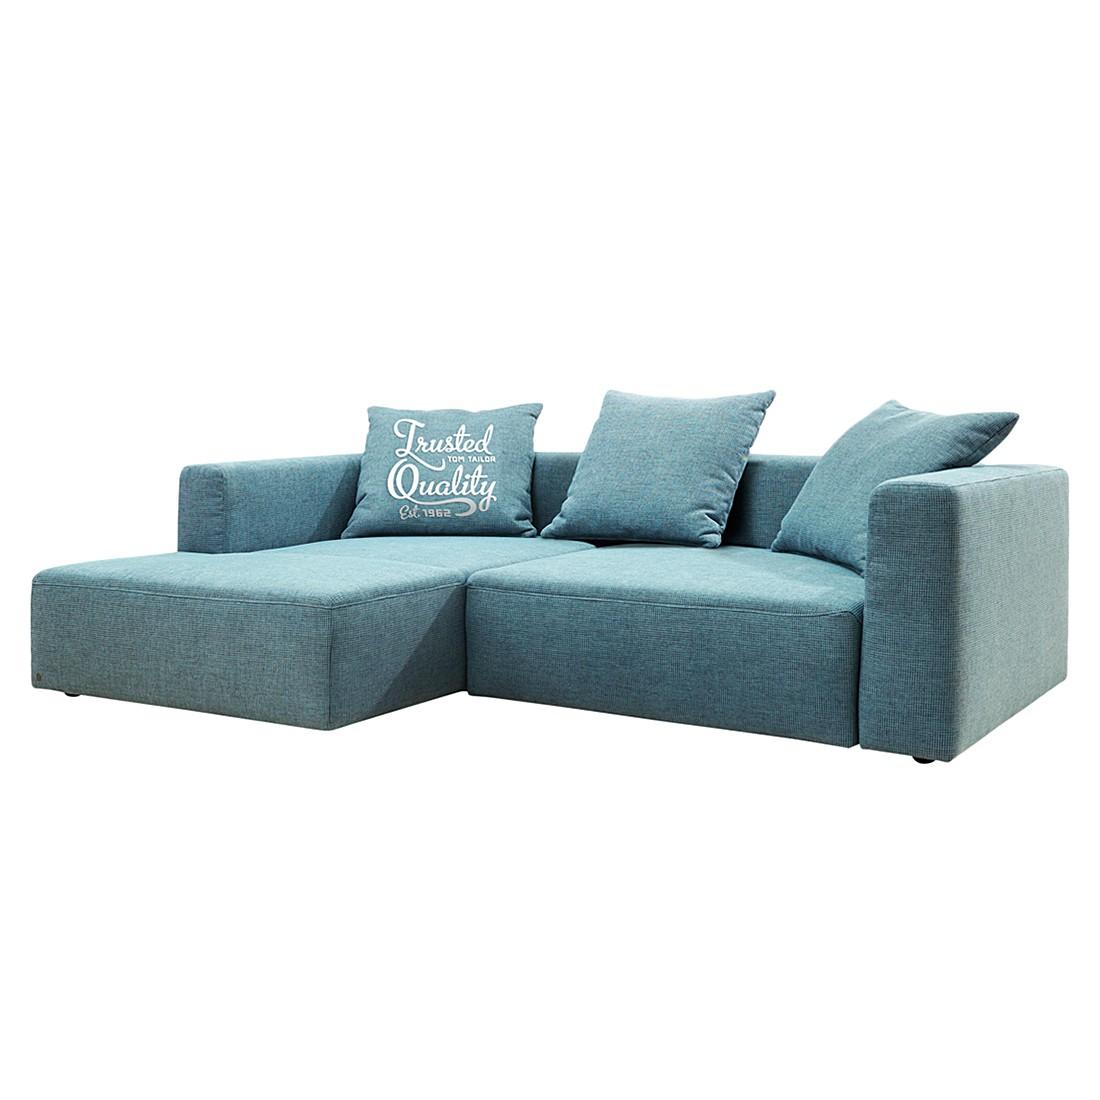 home24 Tom Tailor Ecksofa Heaven Casual Blau Webstoff 242x66x162 cm mit Schlaffunktion